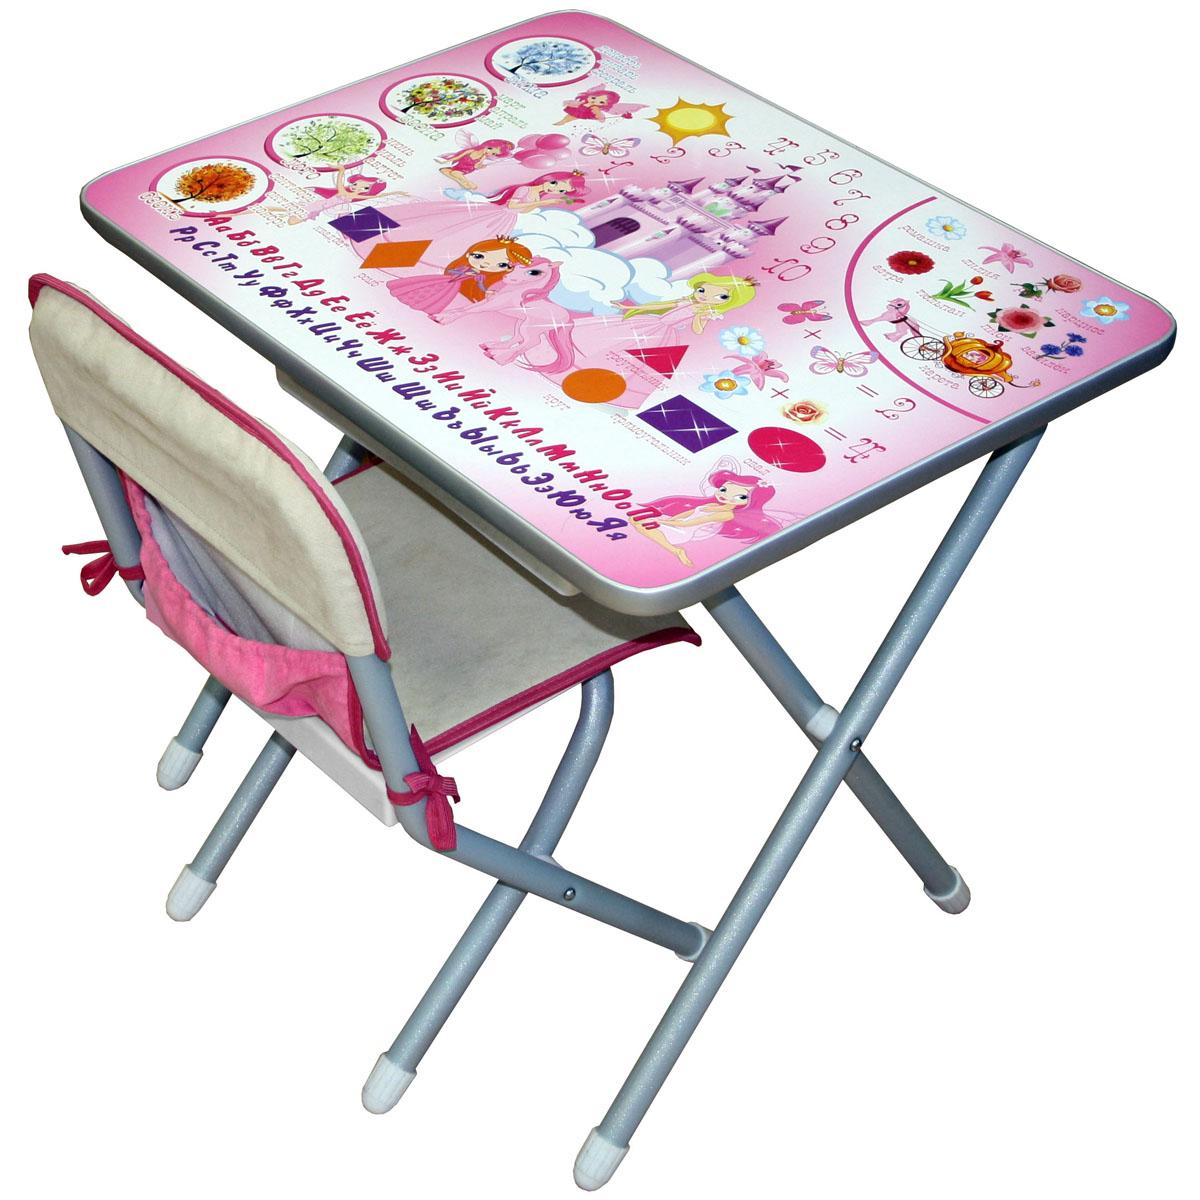 Набор мебели стол и стул Дэми №2 Принцессы Серебристый<br>